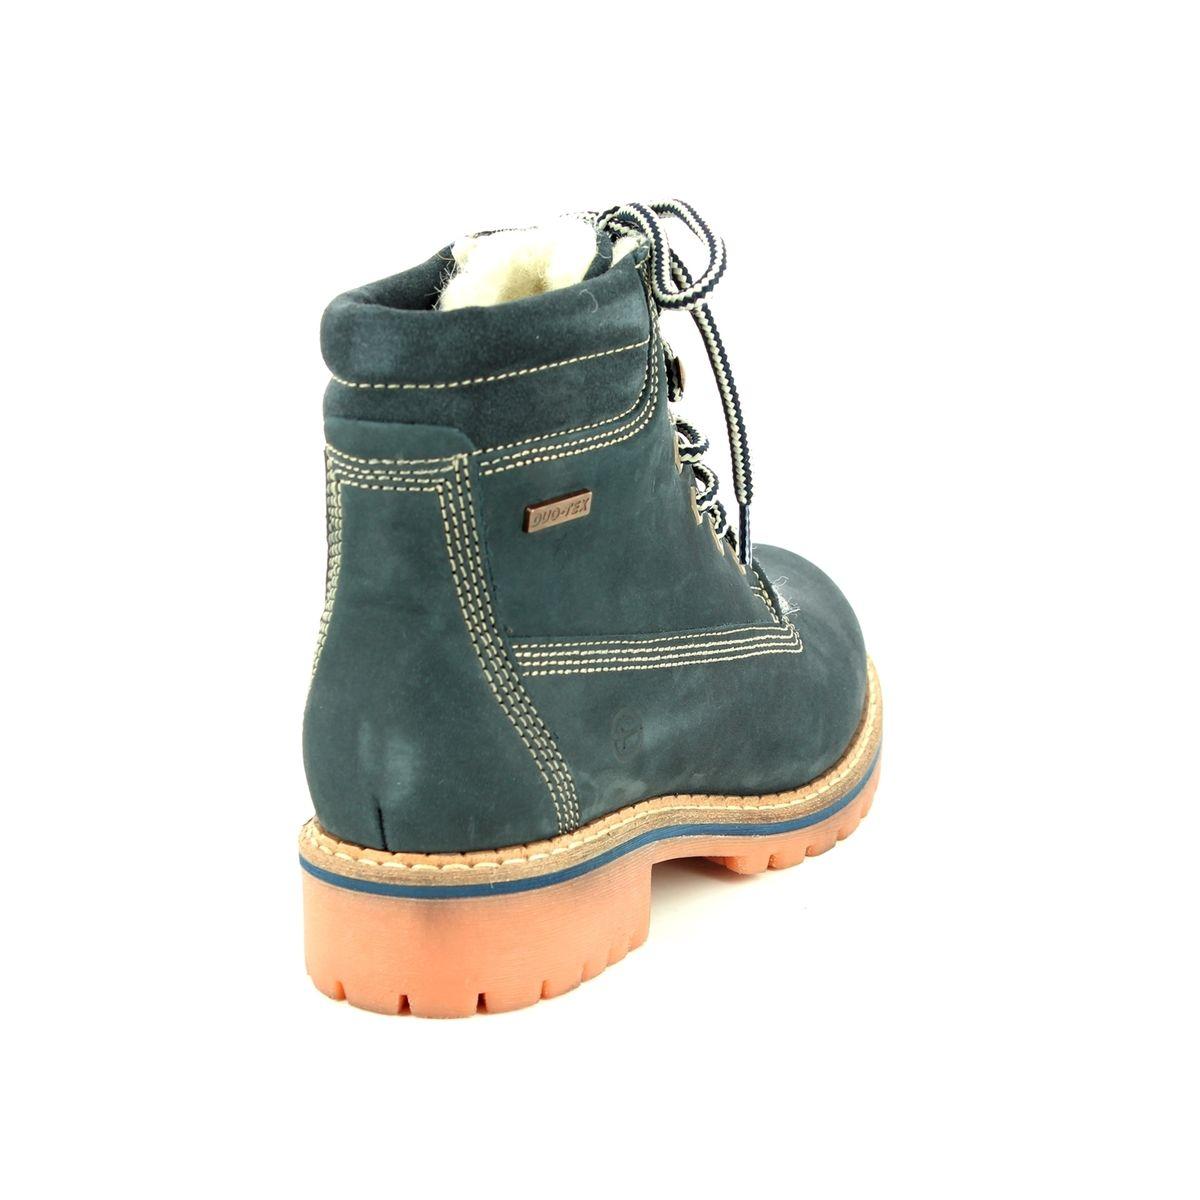 26b105aa172b Tamaris Ankle Boots - Navy nubuck - 26244 21 805 CASTER TEX